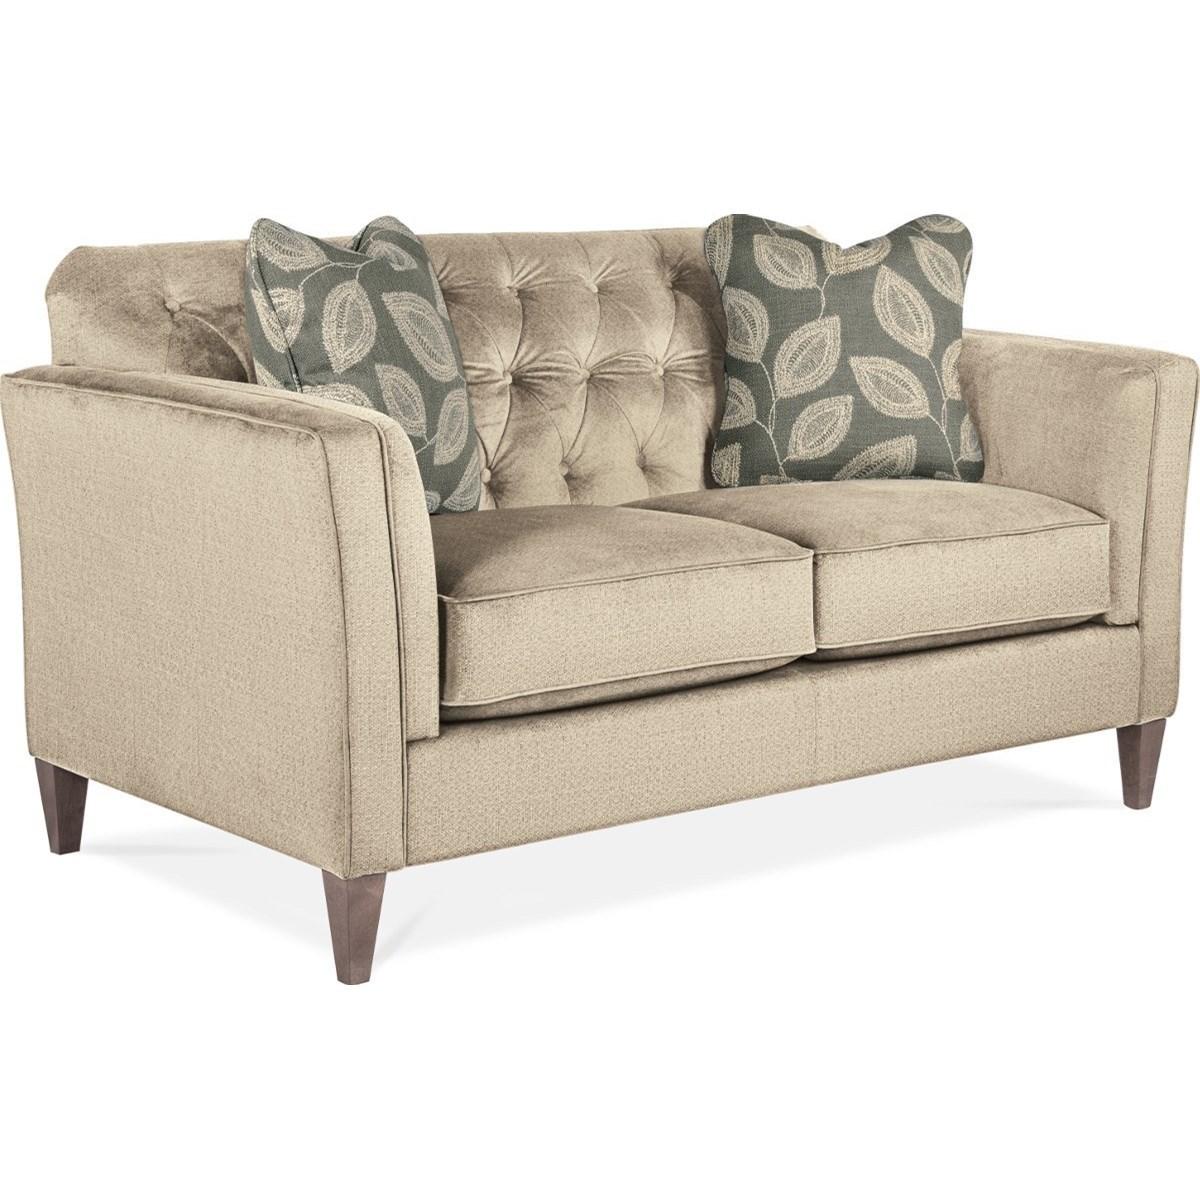 Alexandria Premier Loveseat by La-Z-Boy at Houston's Yuma Furniture